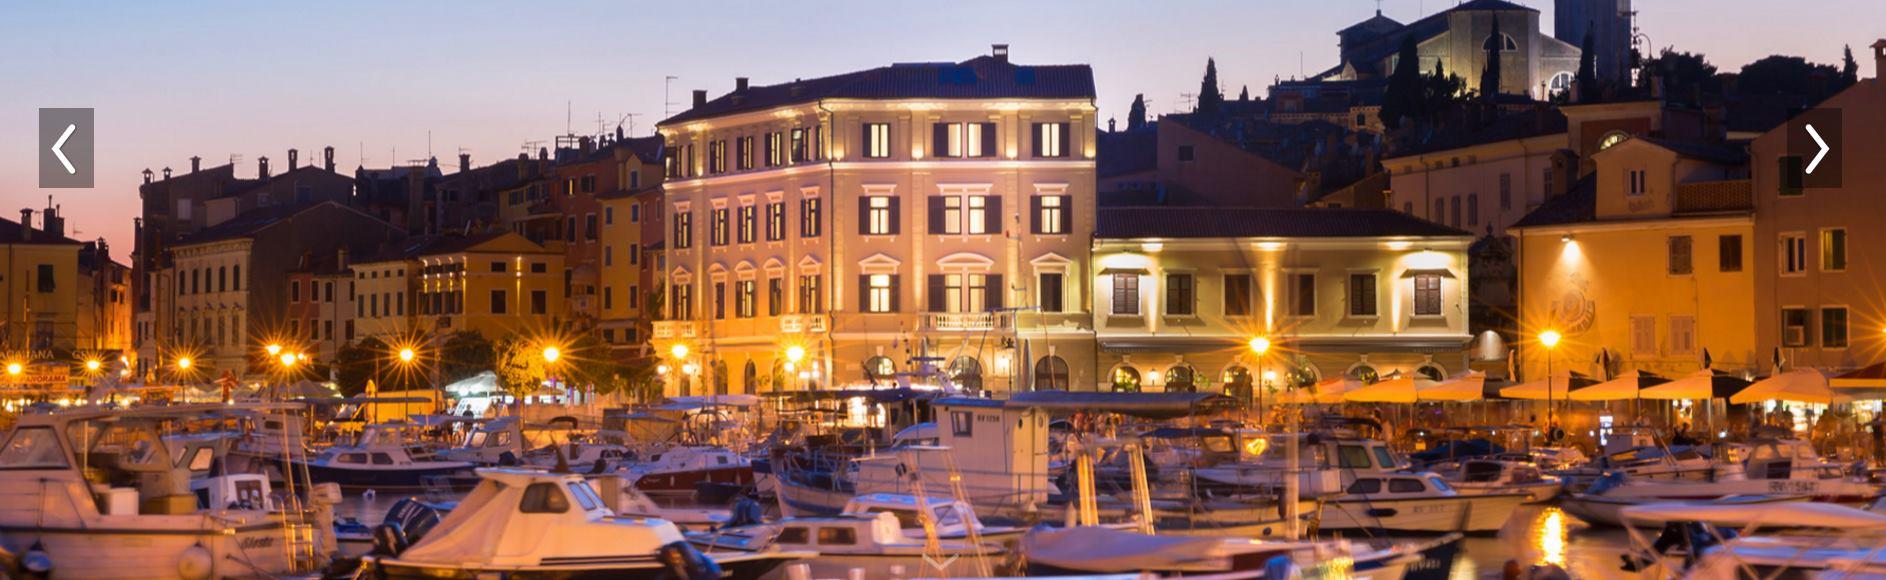 Najstariji rovinjski hotel Adriatic na ekskluzivnoj listi britanskog The Guardiana